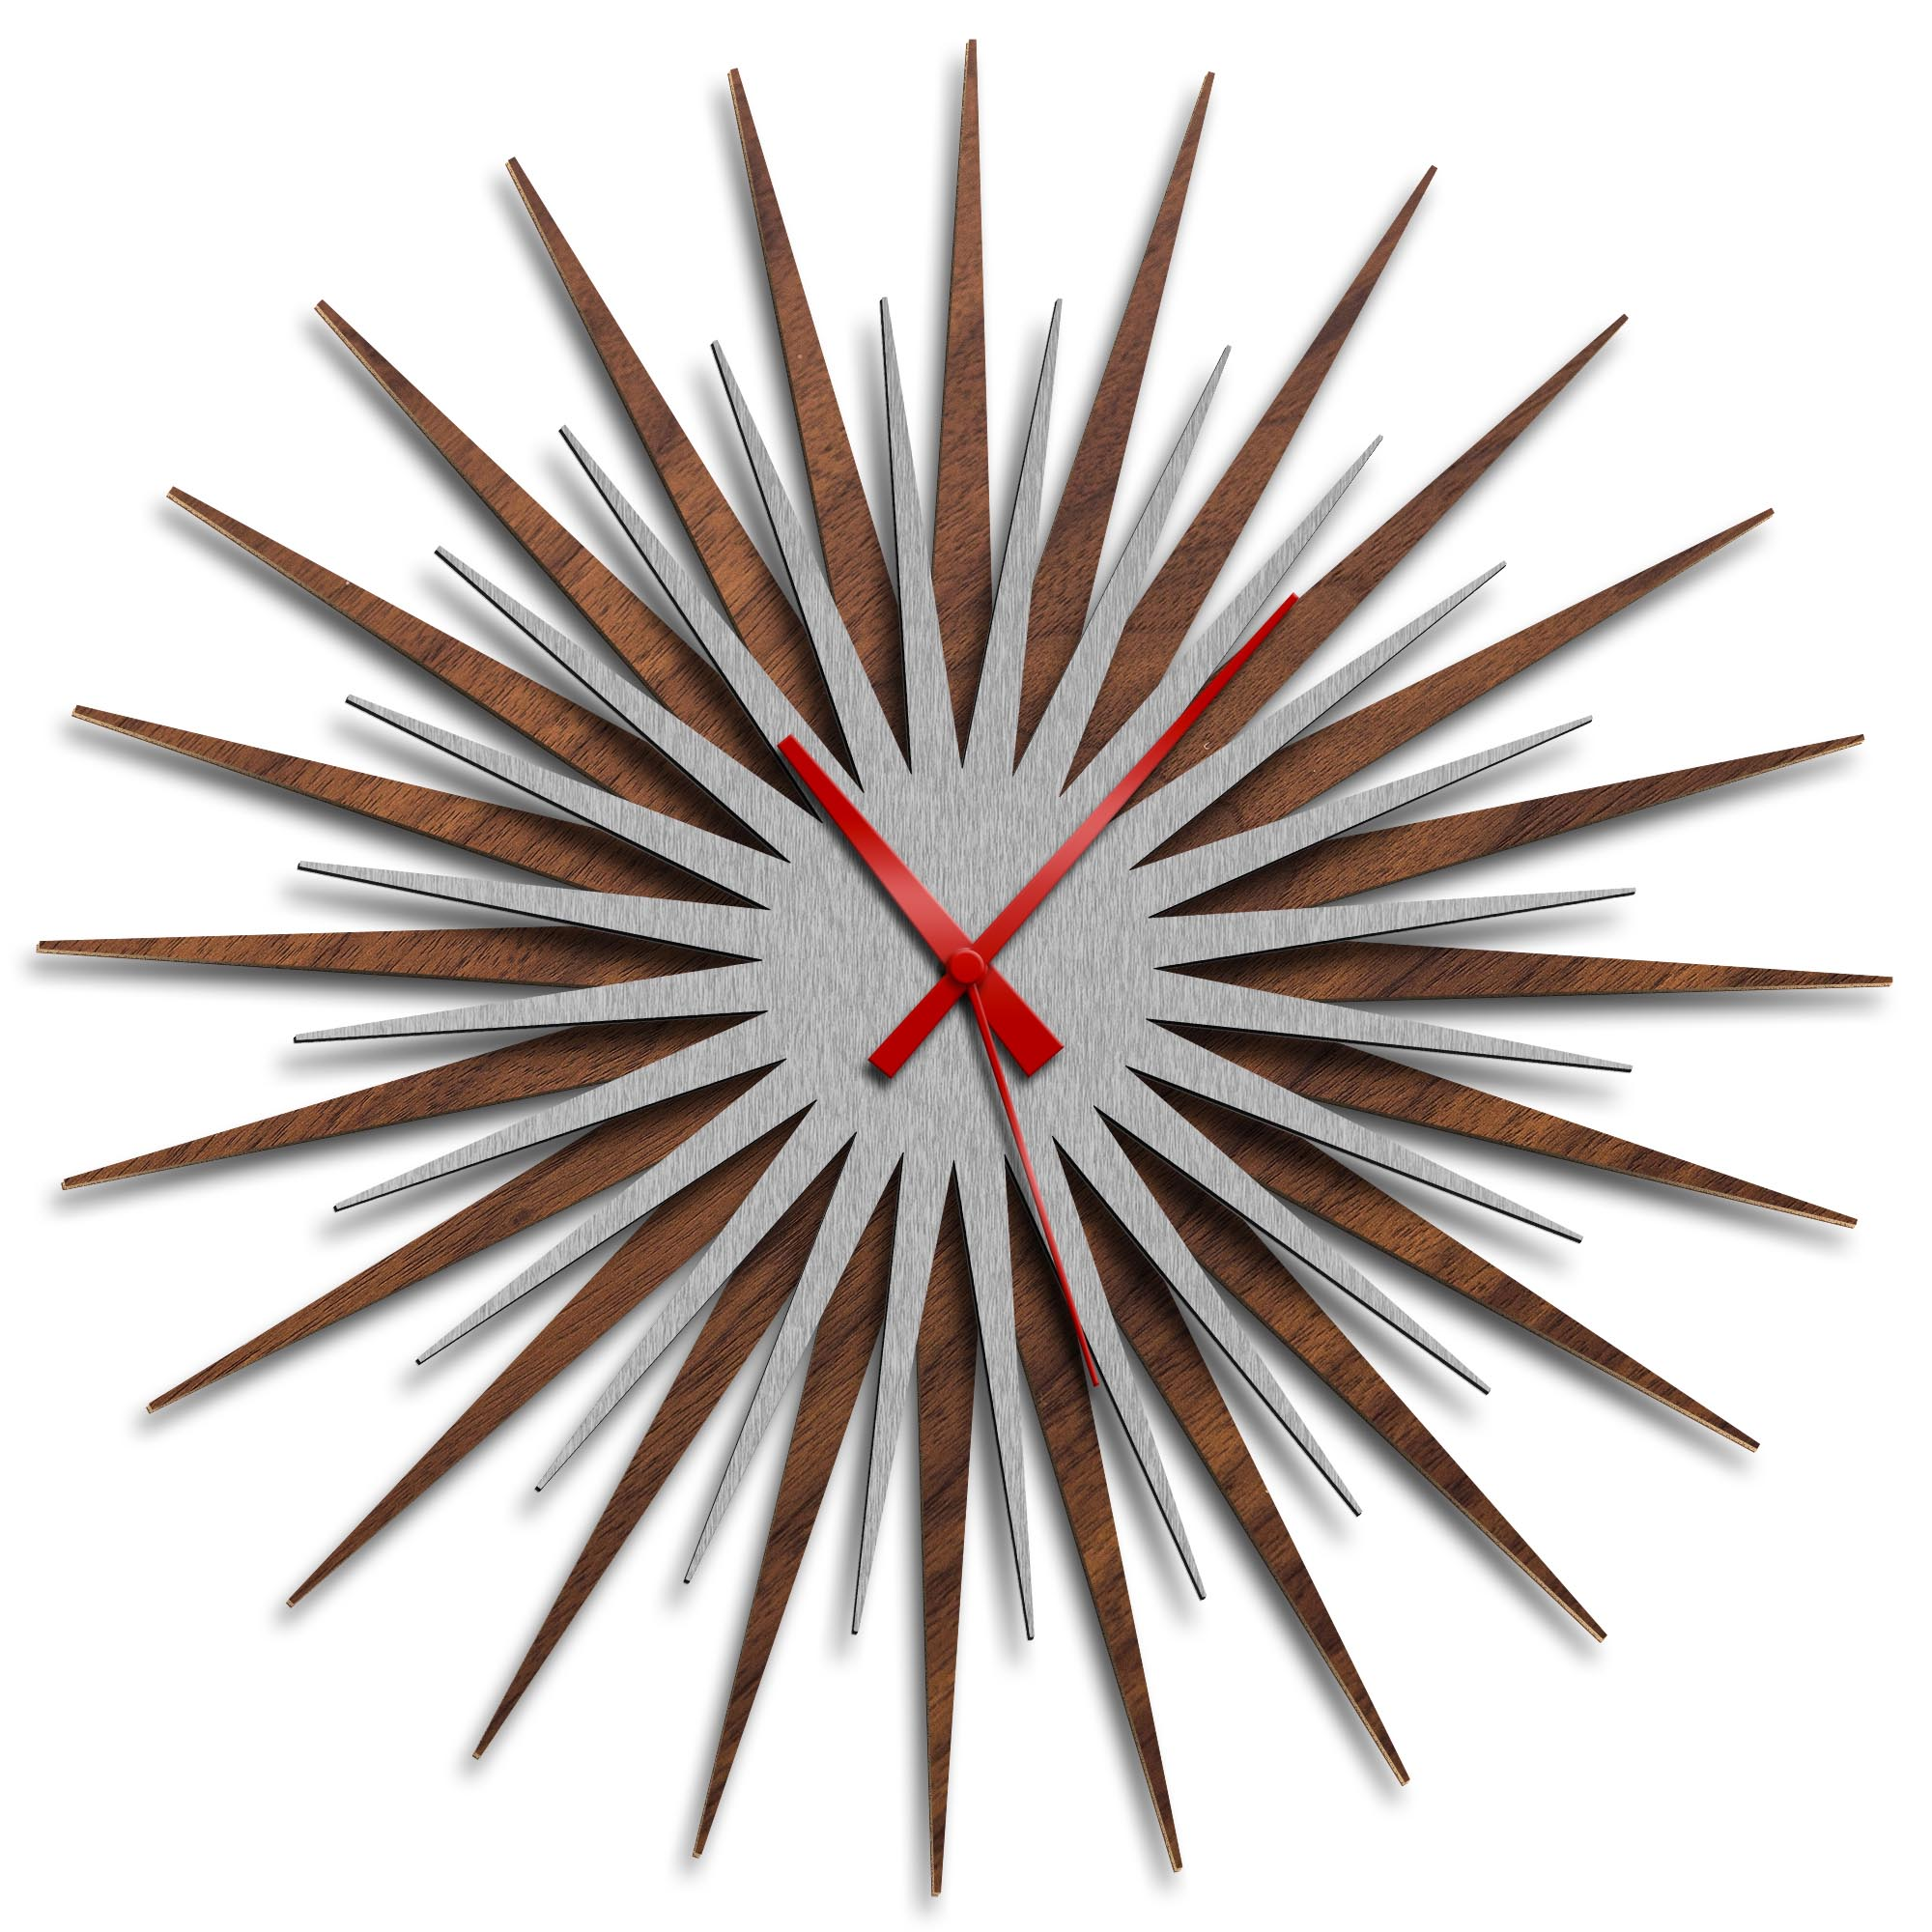 Adam Schwoeppe 'Atomic Era Clock Walnut Silver Red' Midcentury Modern Style Wall Clock